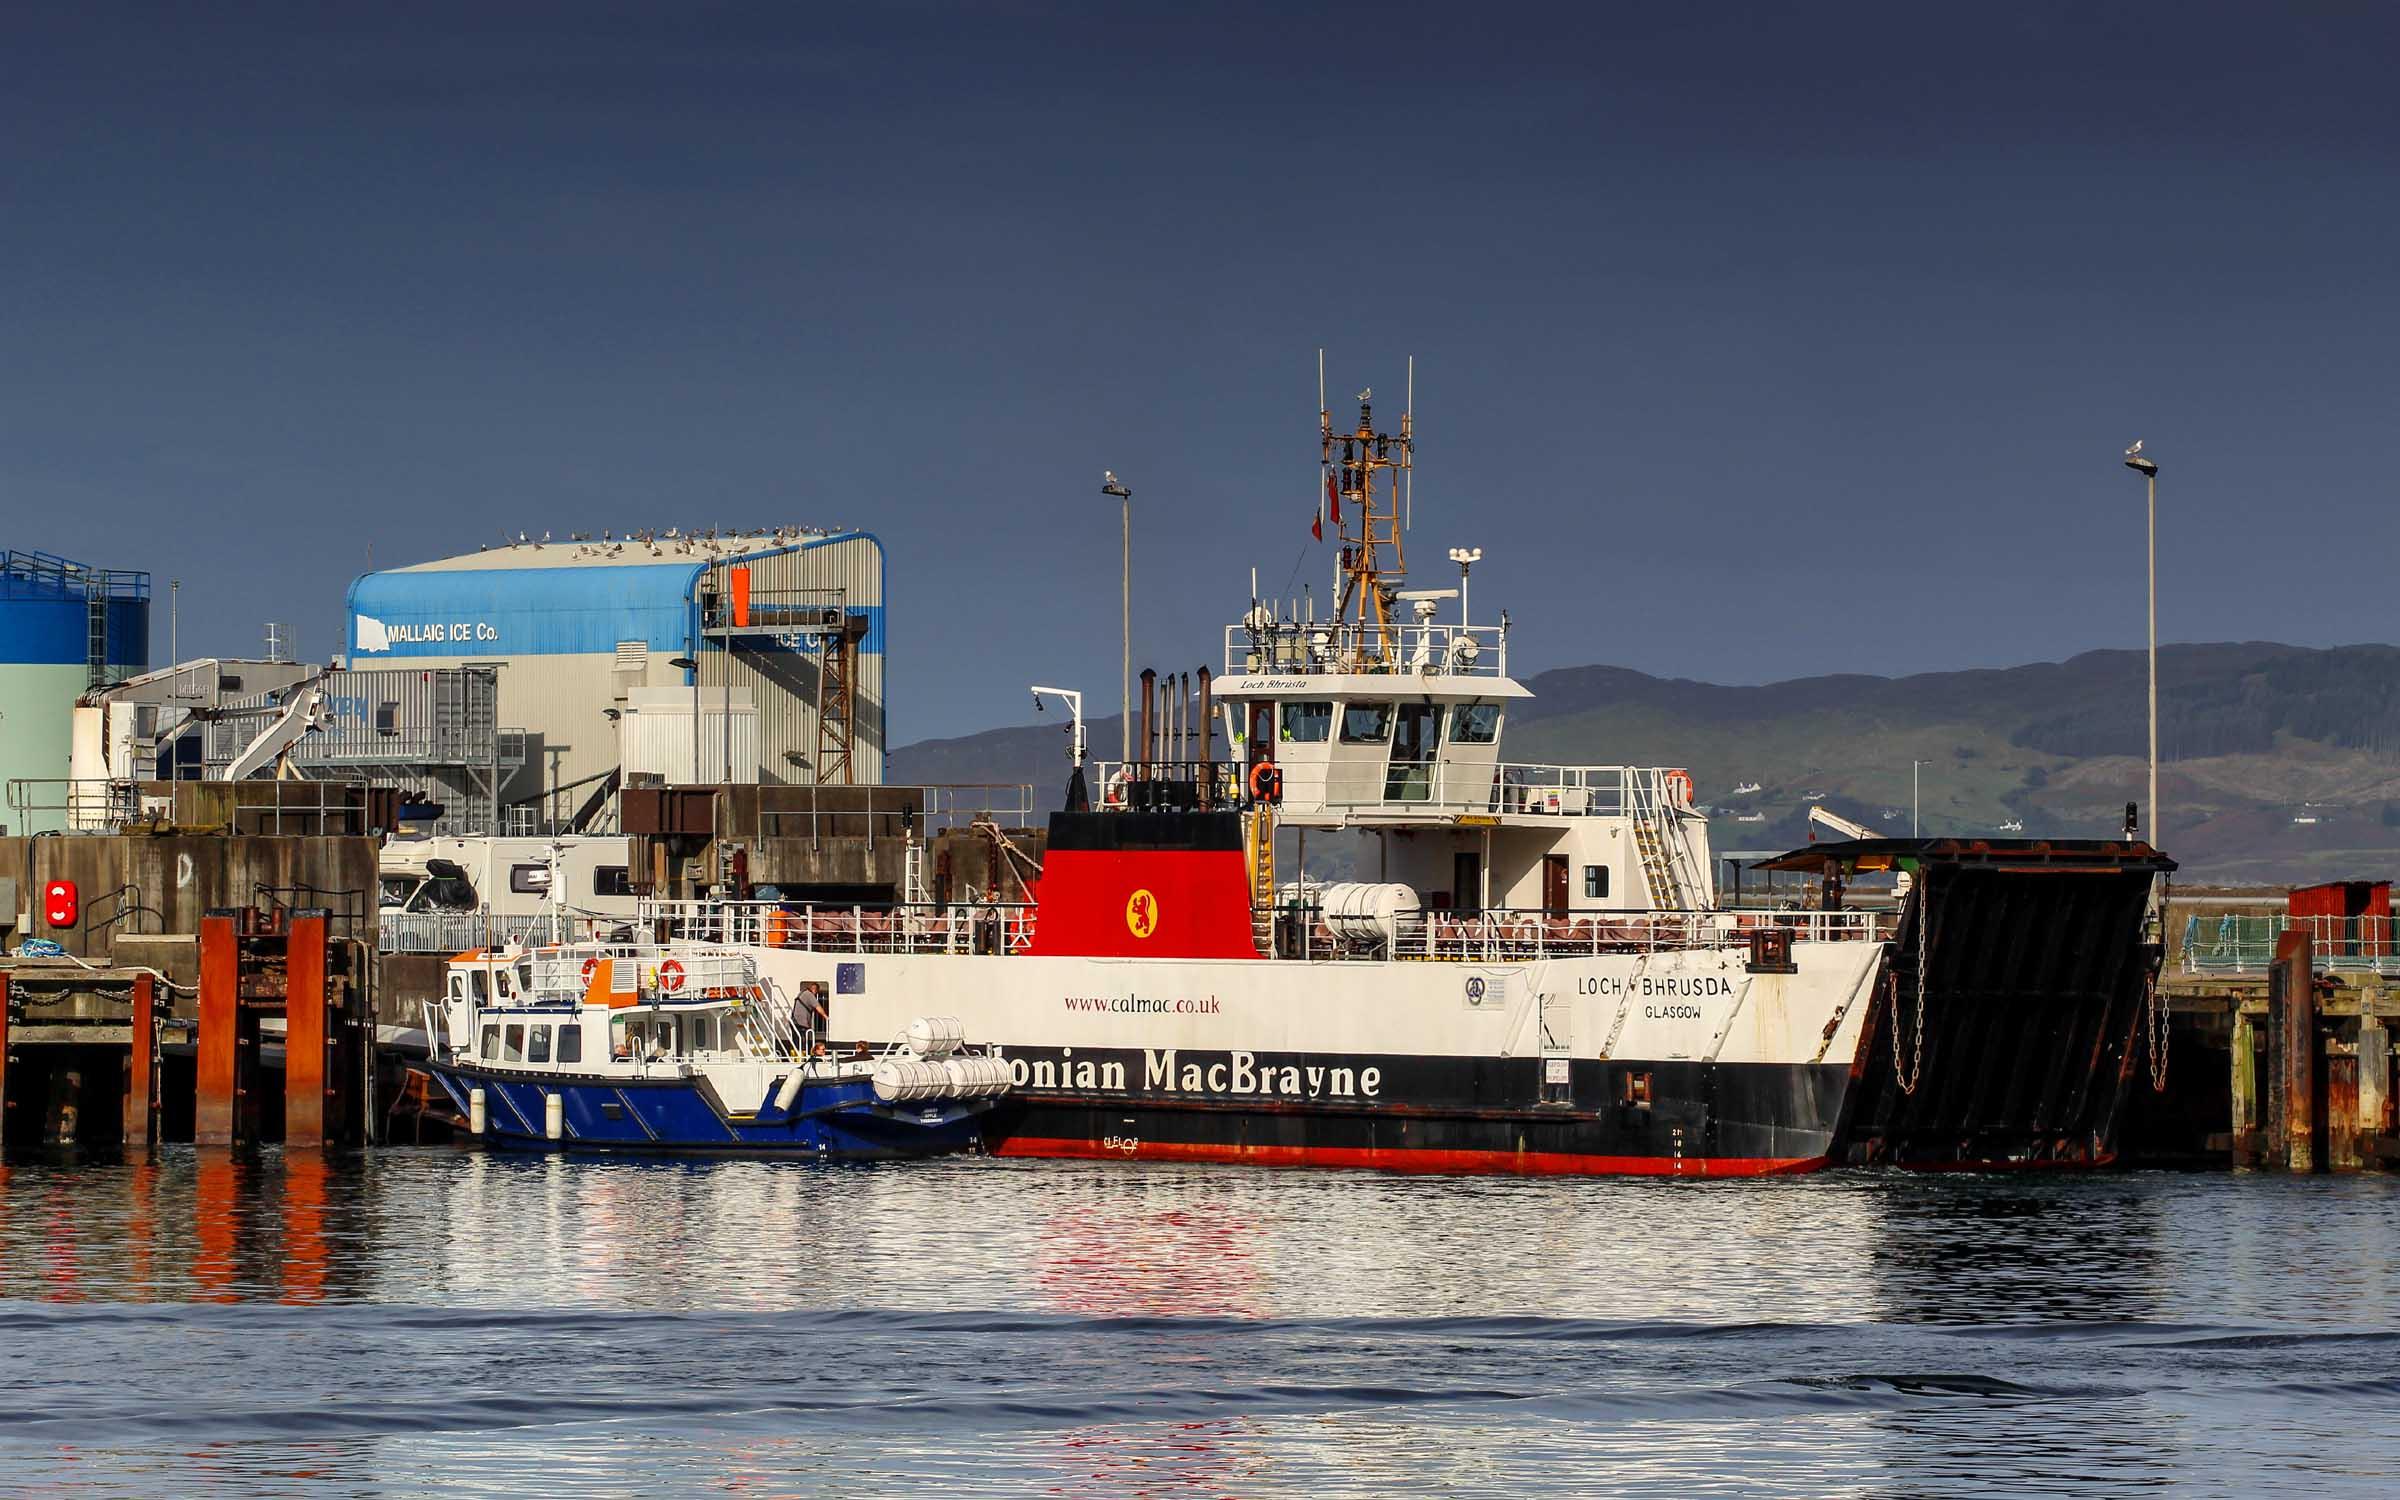 Loch Bhrusda and Highest Apple at Mallaig (Ships of CalMac)